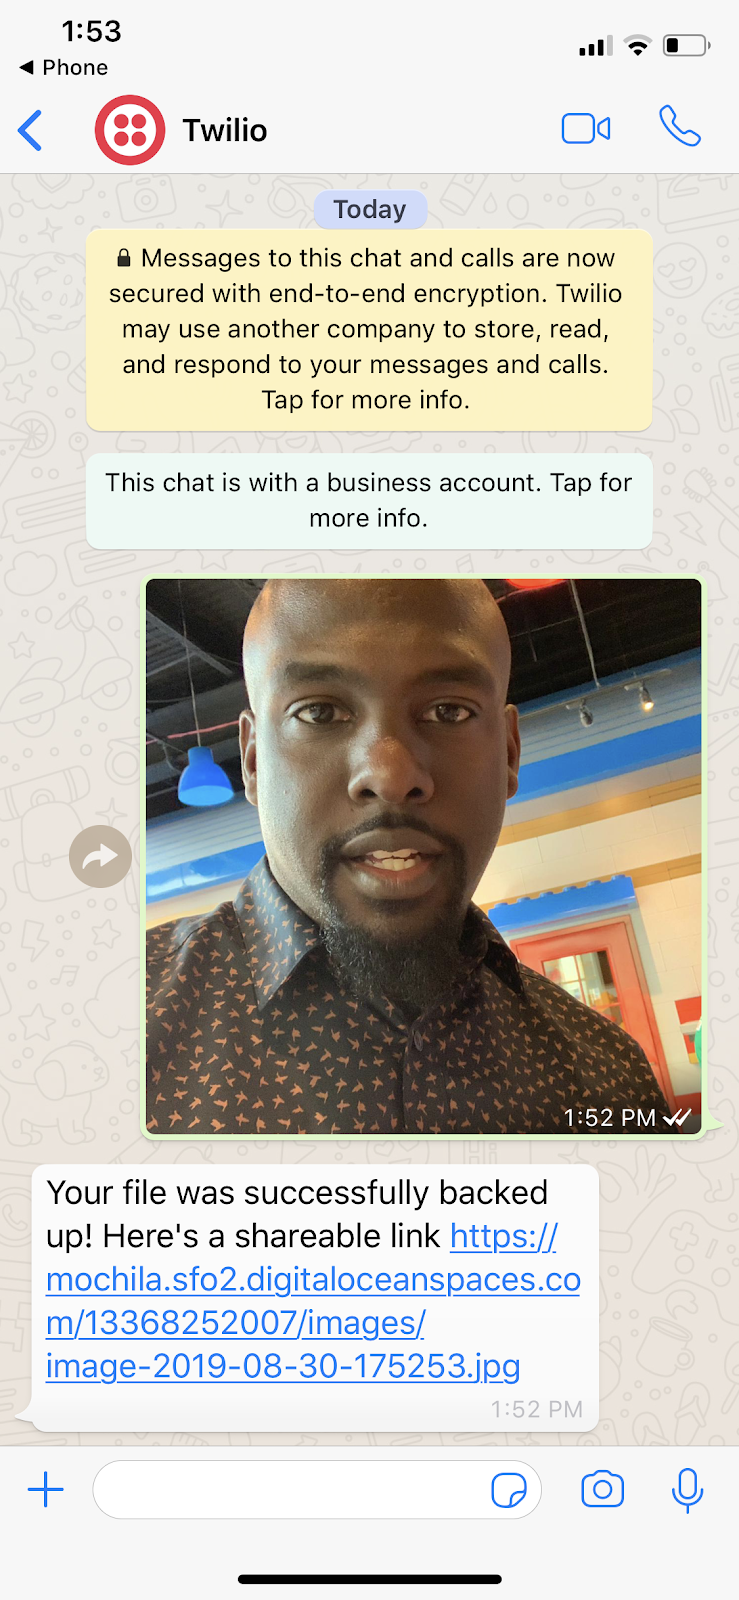 Twilio WhatsApp screen on iPhone